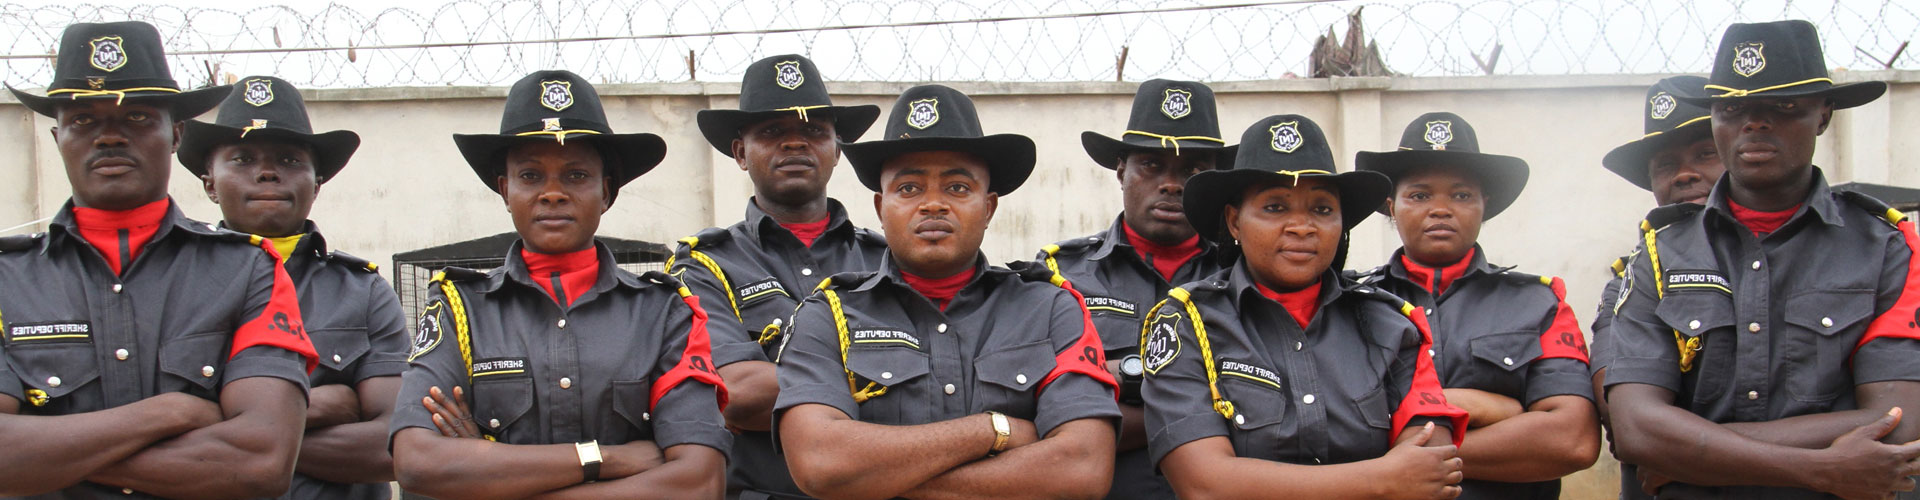 Sheriff-Header-61